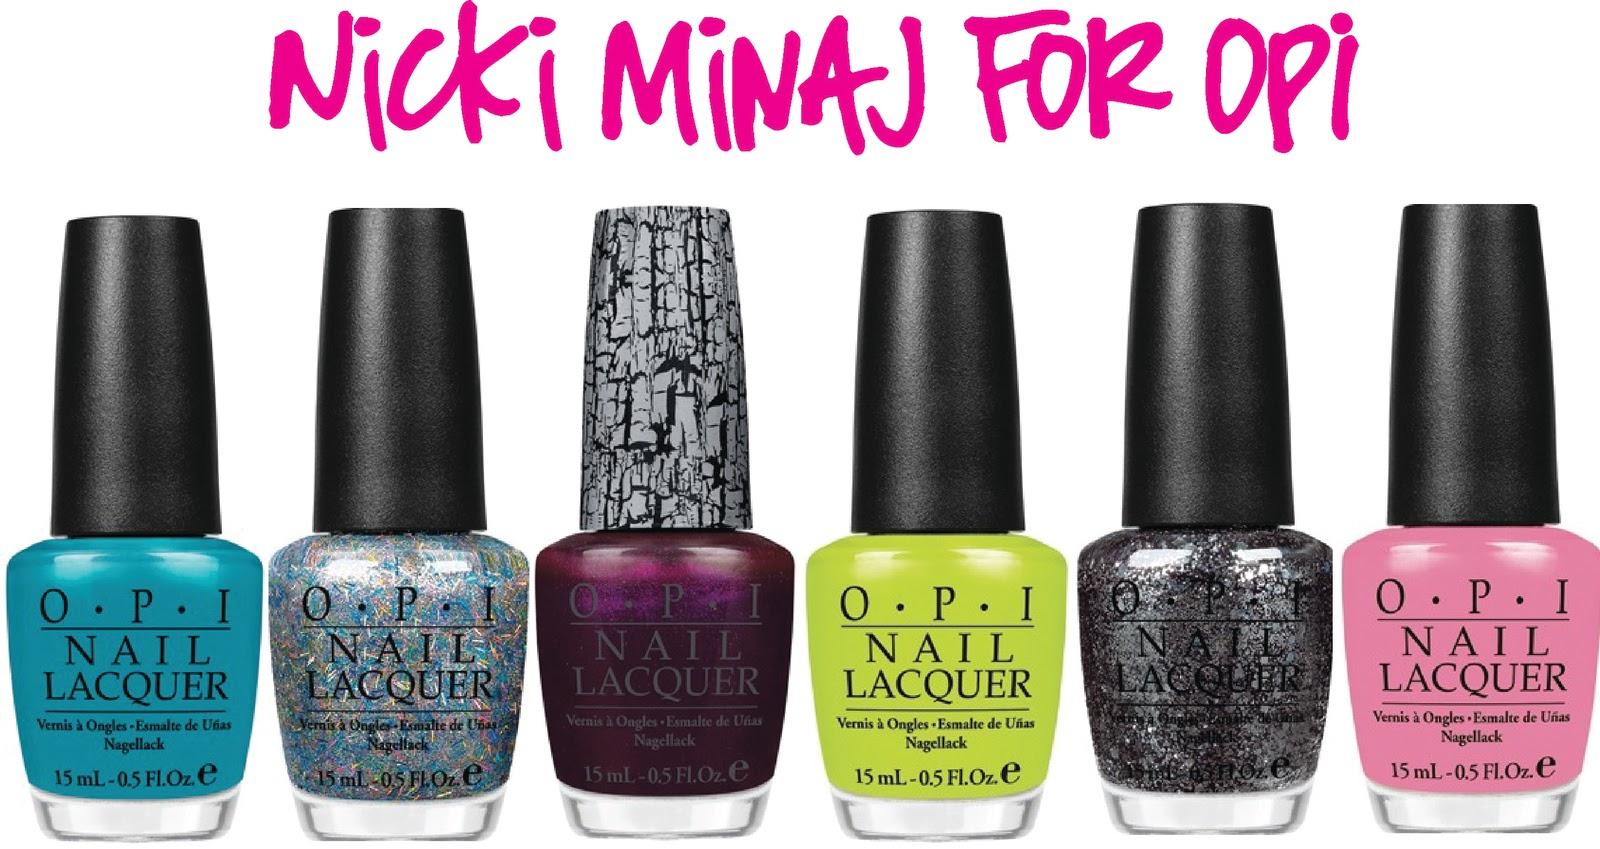 Stylish Nail Polish Collaboration: Nicki Minaj and OPI | Stylelista ...